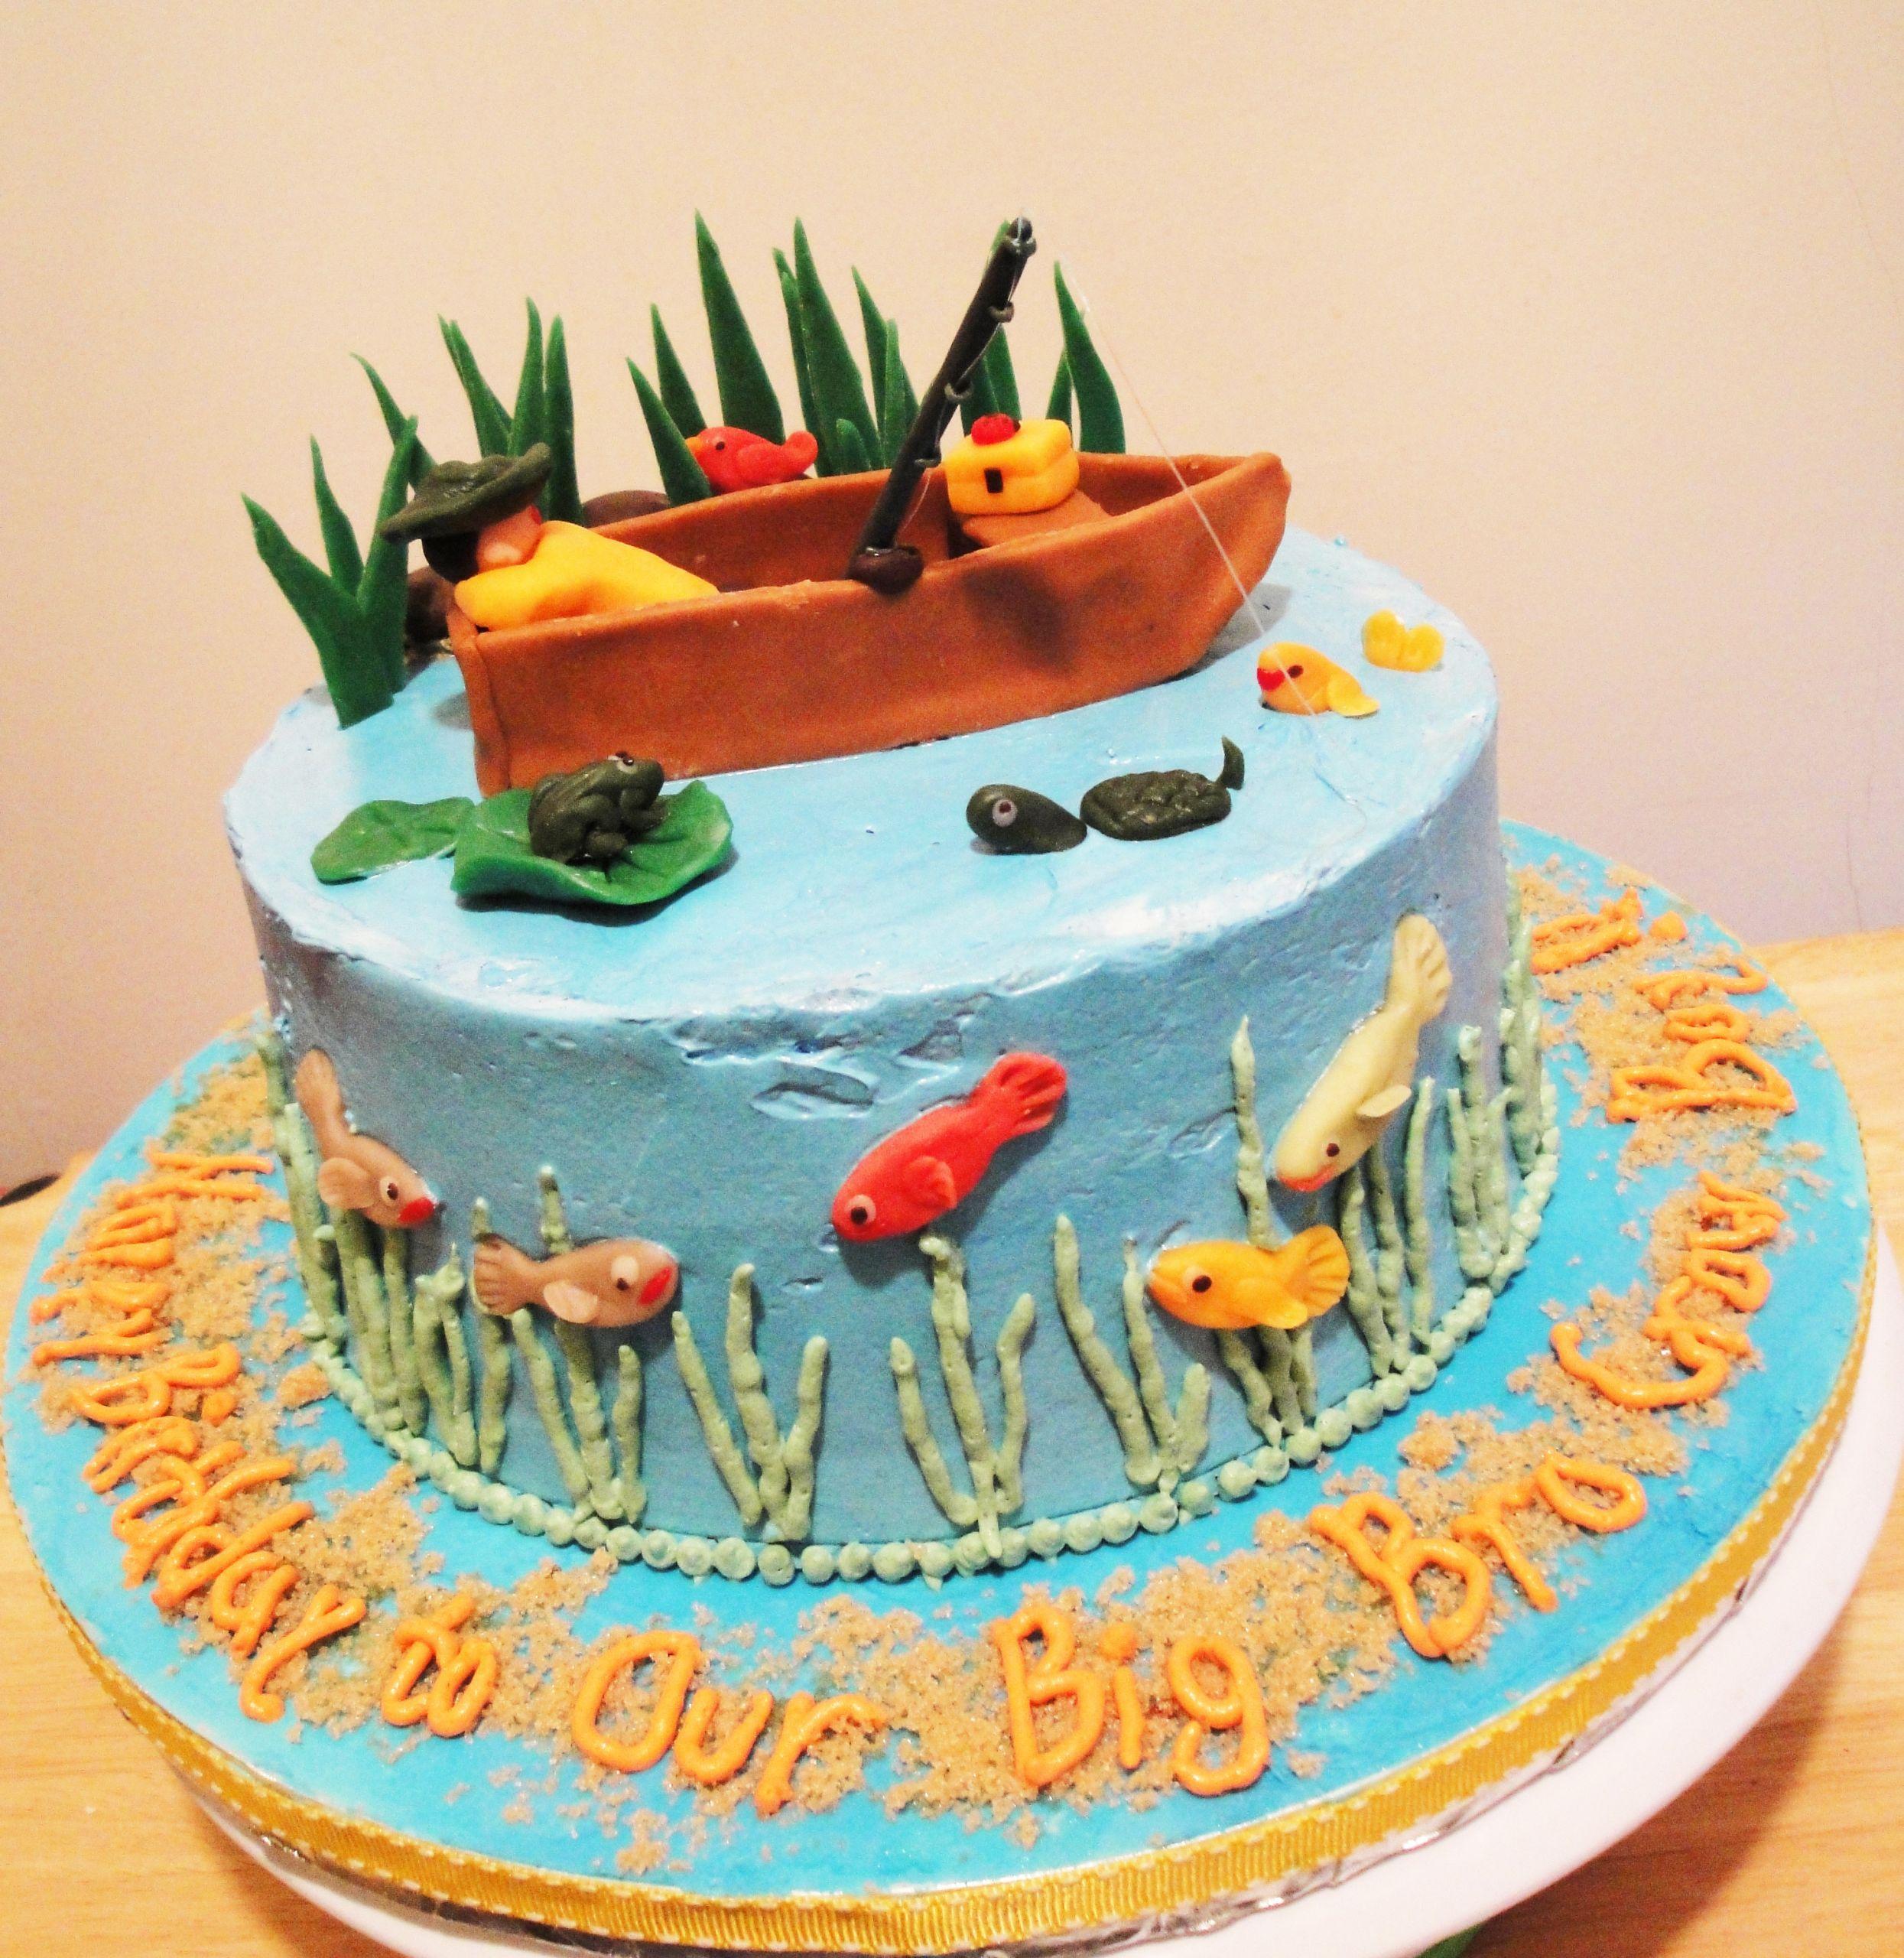 Fishing Birthday Cakes  Gone Fishing Birthday Cake – Twee tea licious